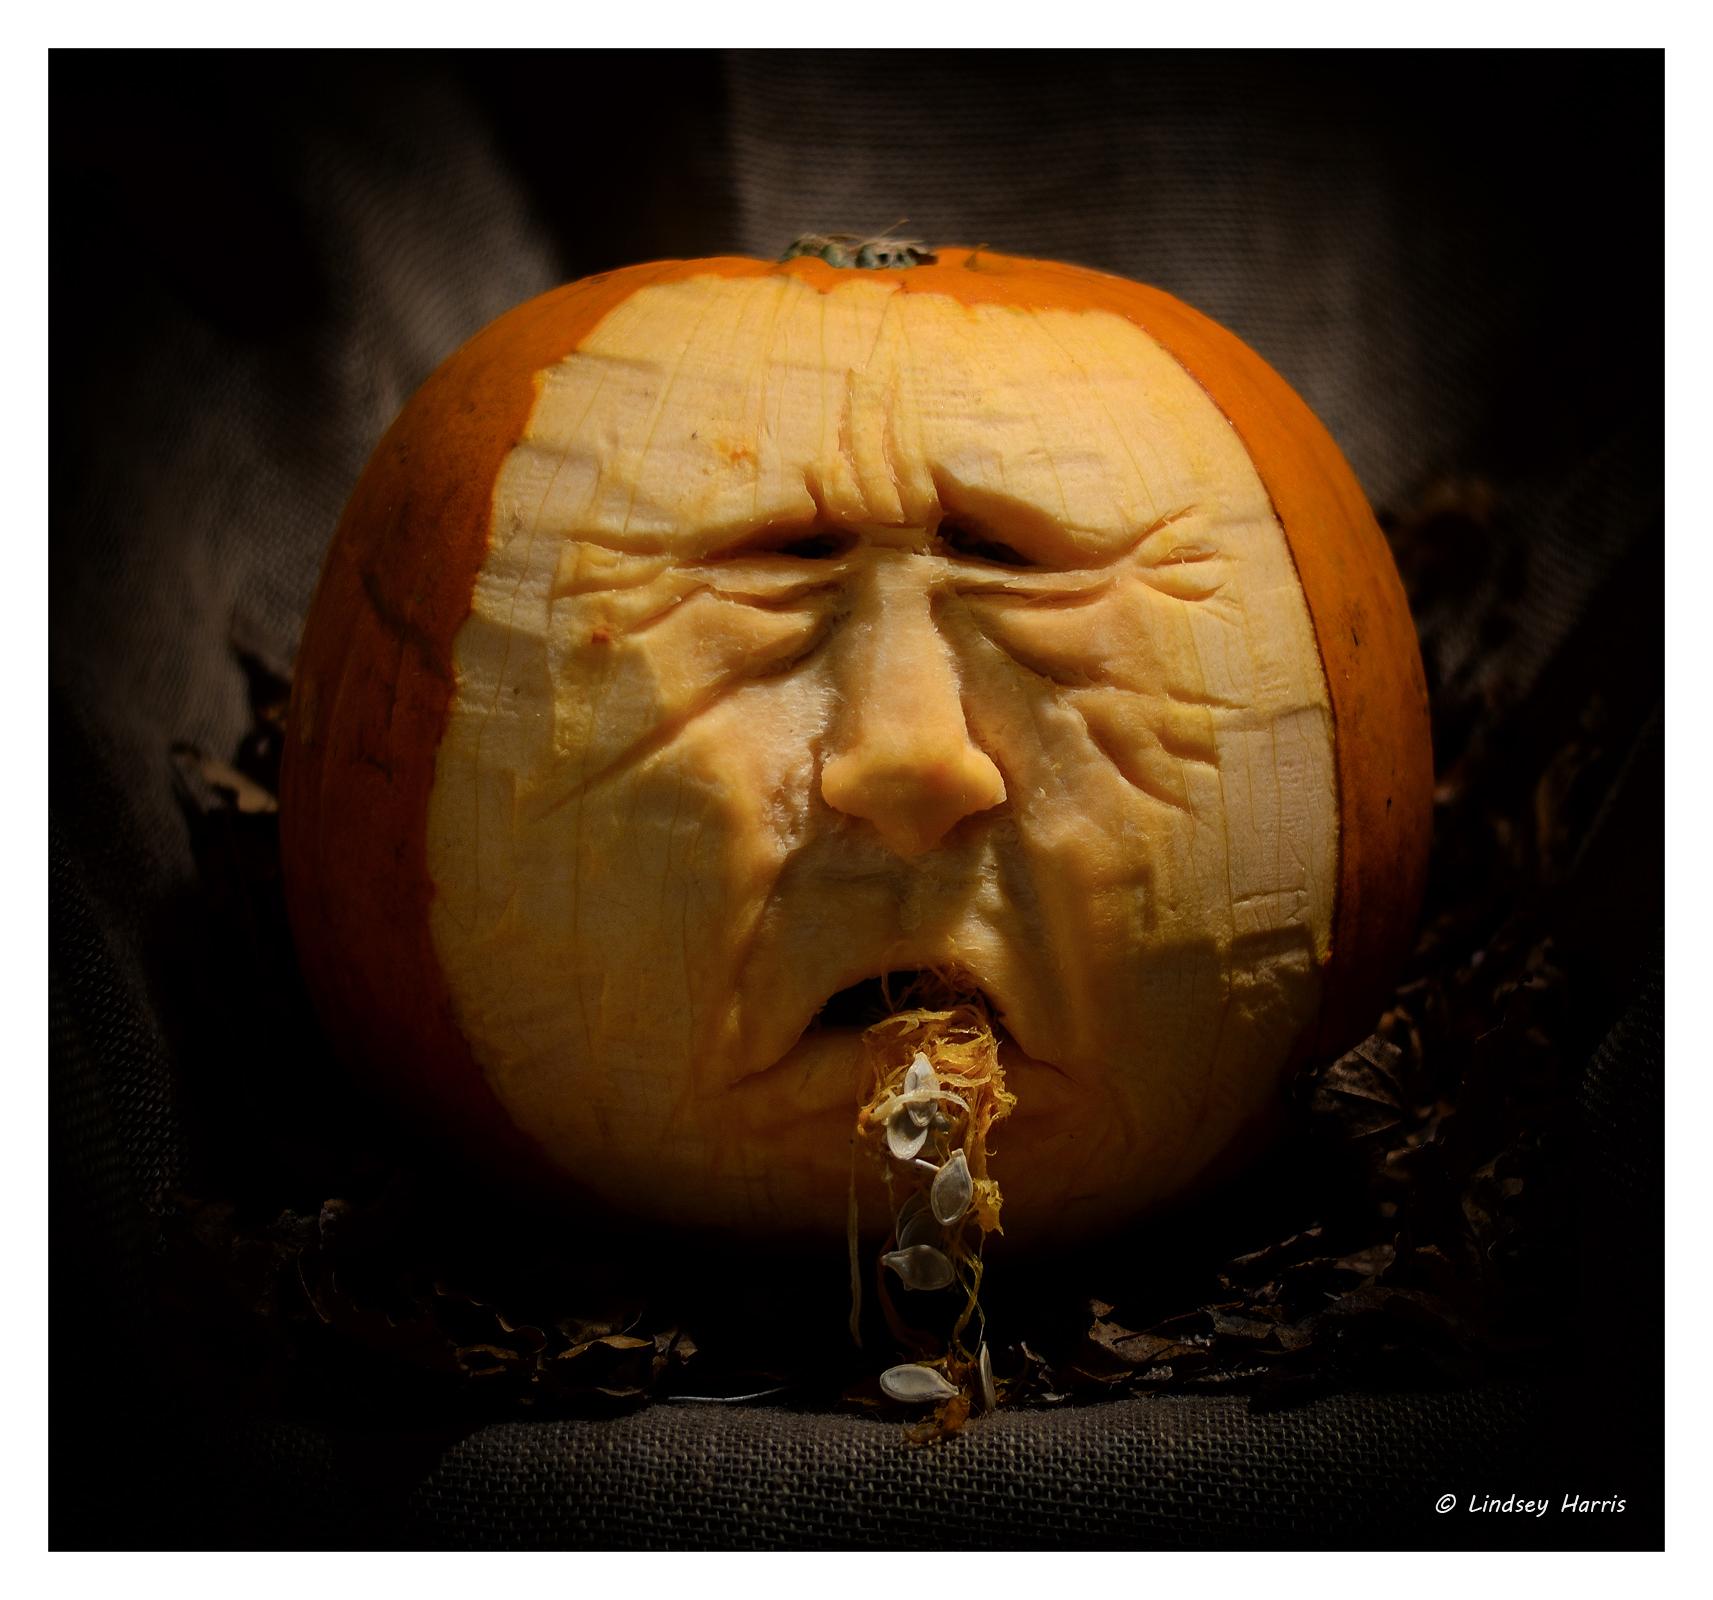 Halloween photos by lindsey harris